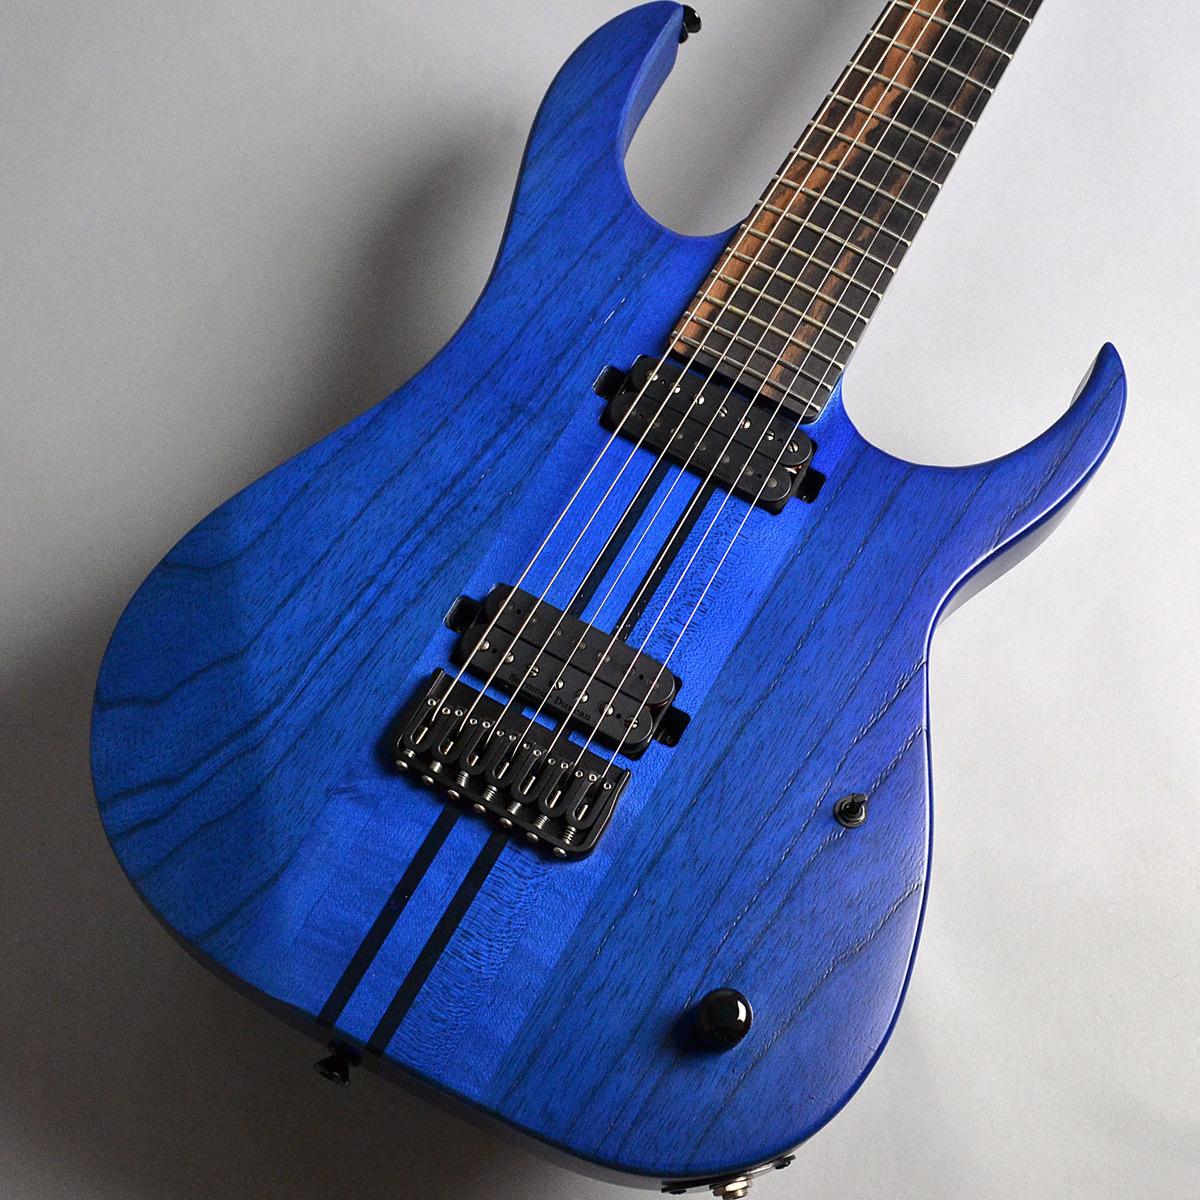 Strictly 7 Guitars Cobra Std7 HT/T / Dark Blue Stain エレキギター(7弦) 【ストリクトリー7ギターズ】【新宿PePe店】【Seymour Duncanピックアップ搭載】